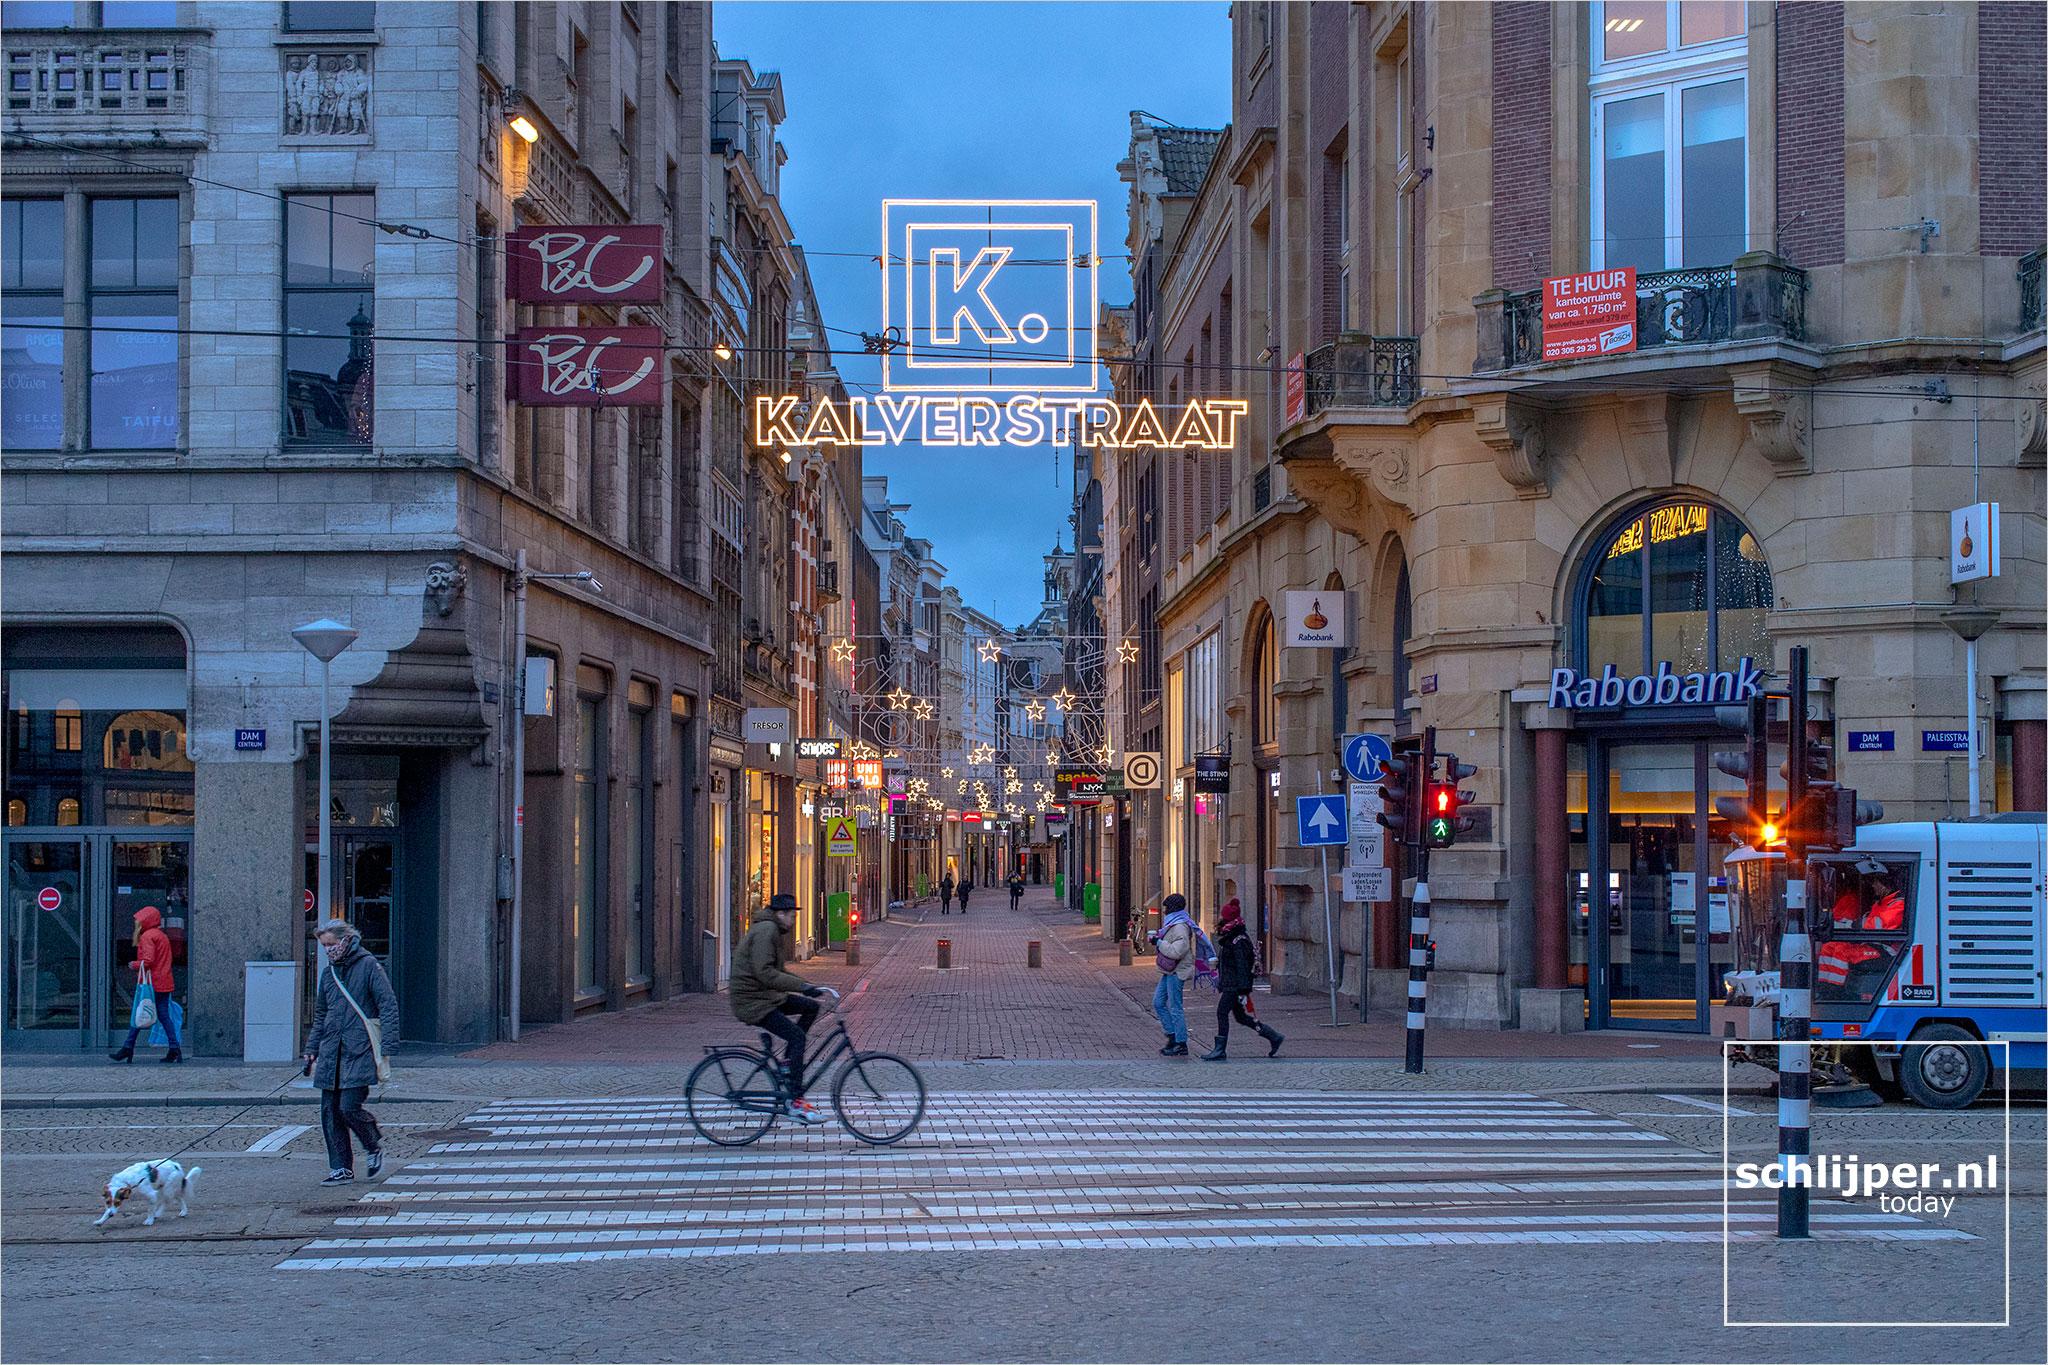 The Netherlands, Amsterdam, 4 januari 2021